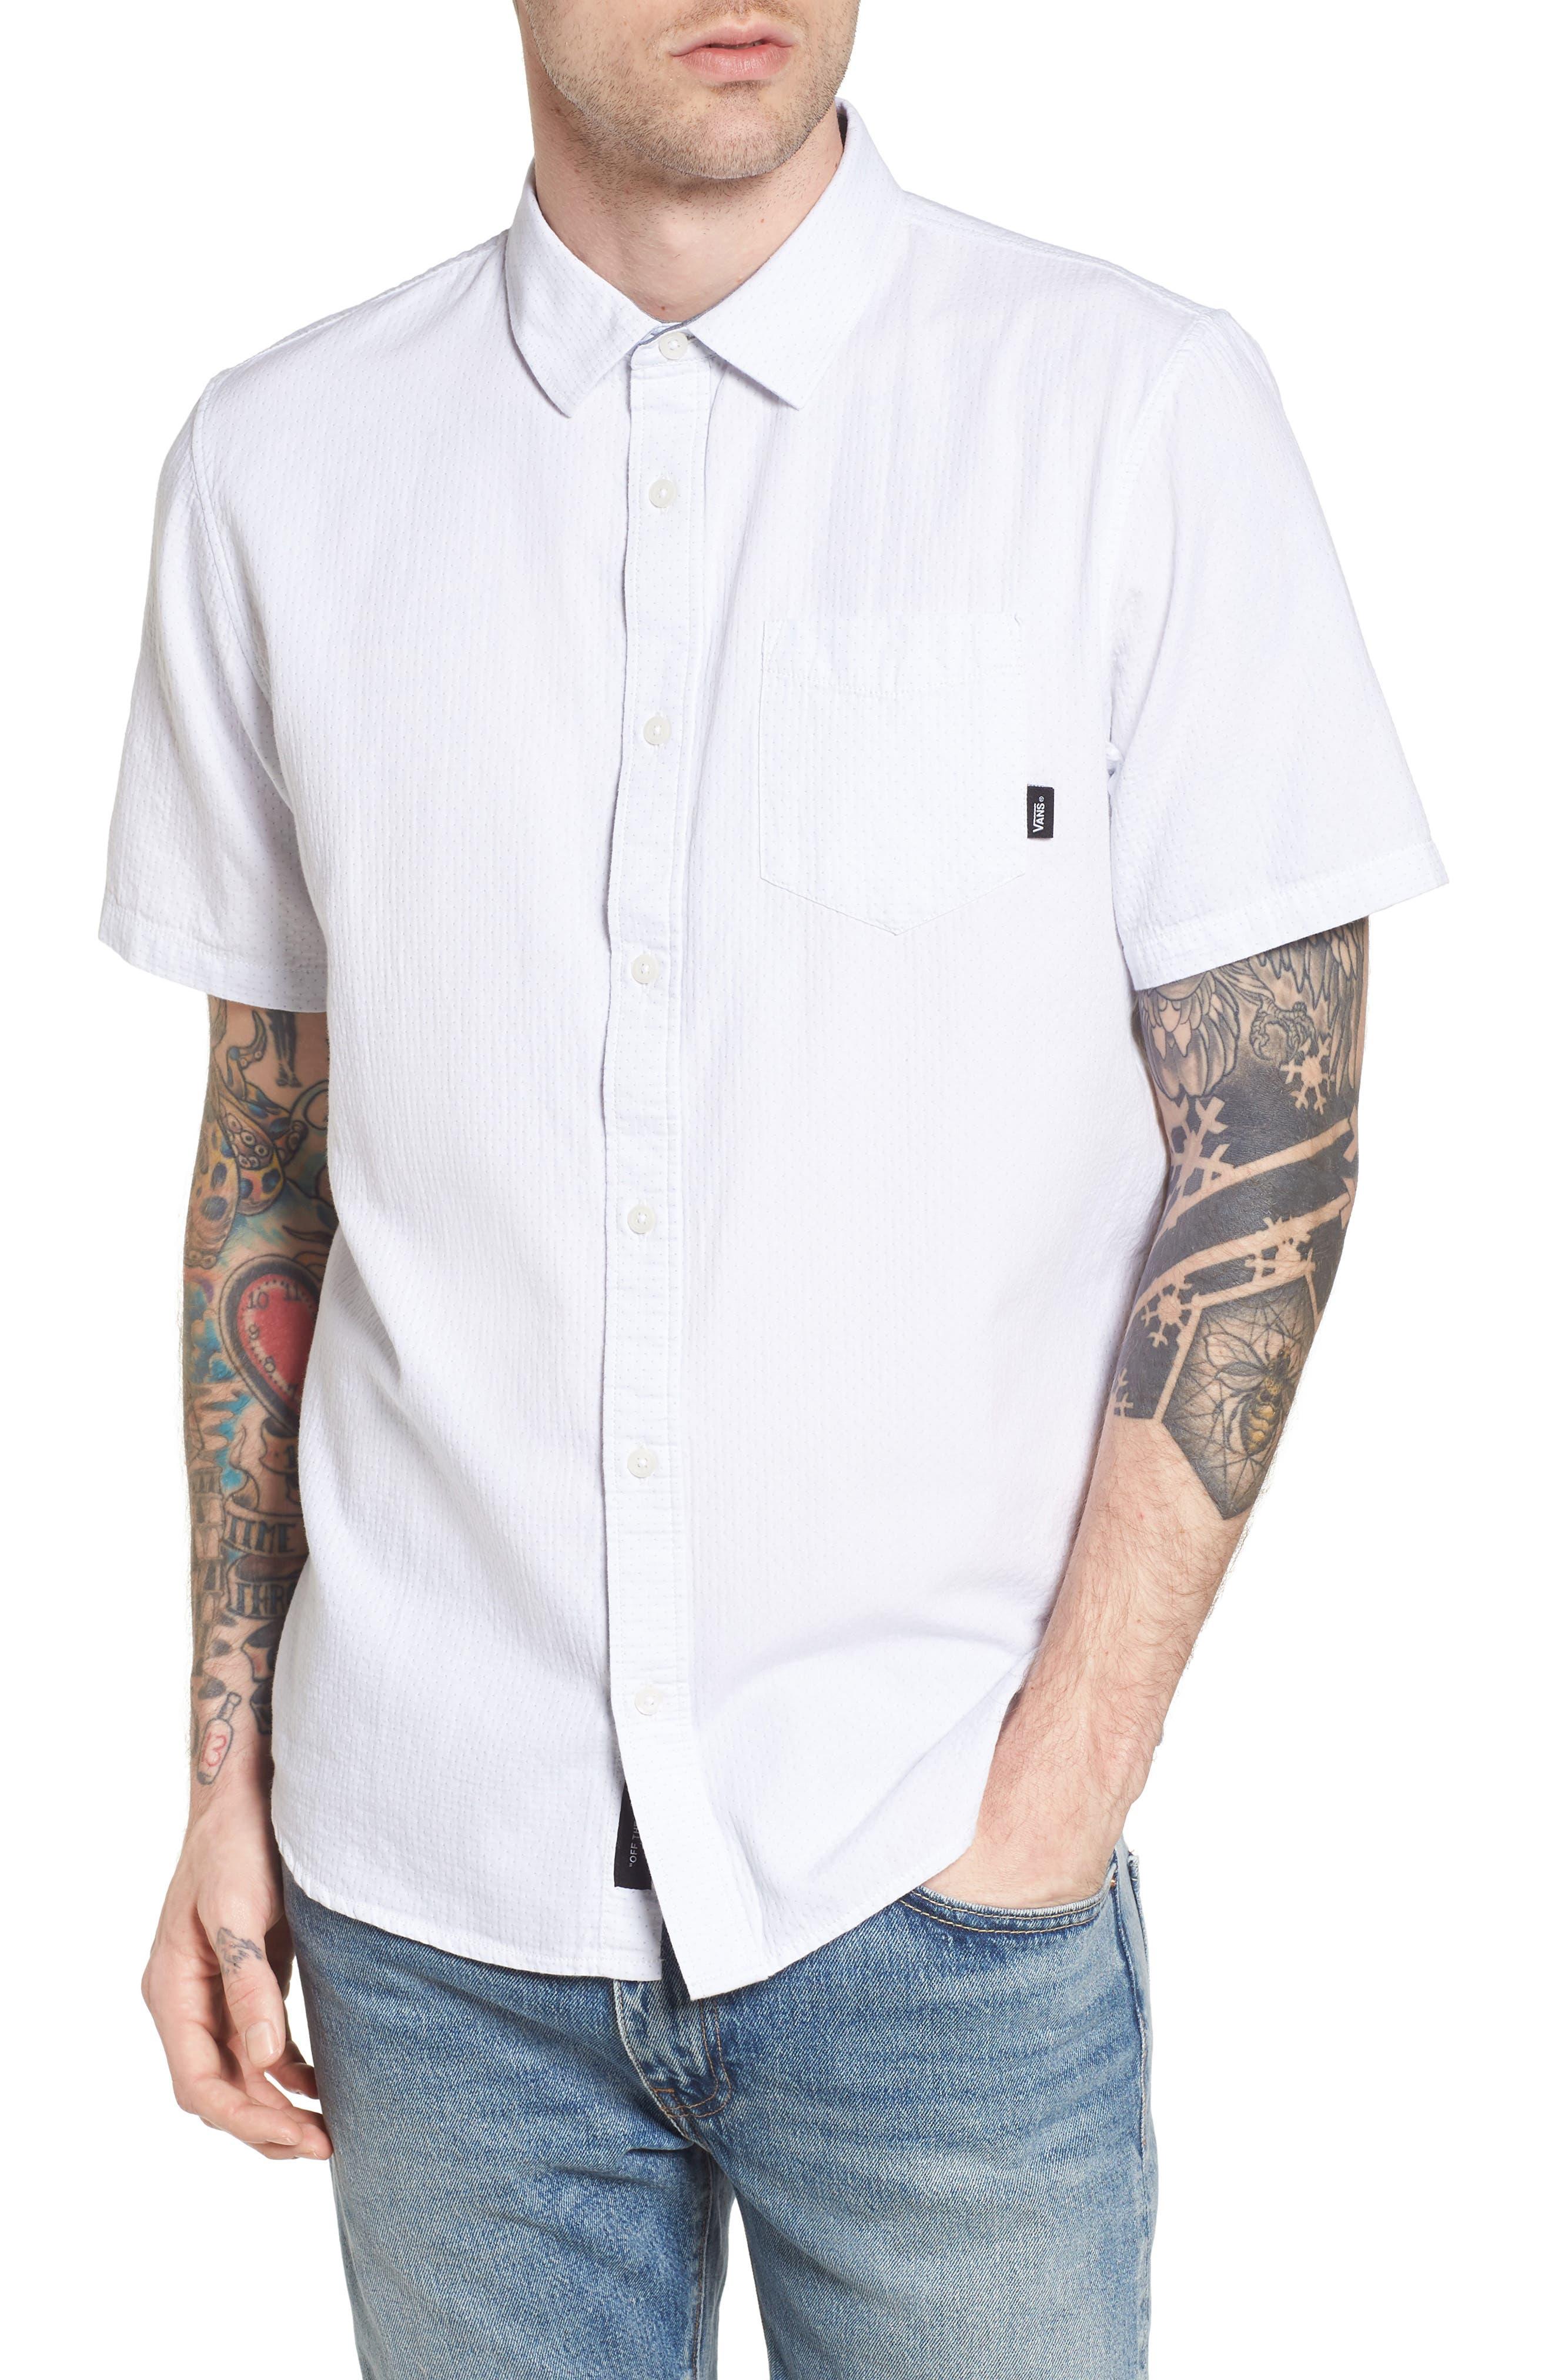 Fairdale Woven Shirt,                             Main thumbnail 1, color,                             White